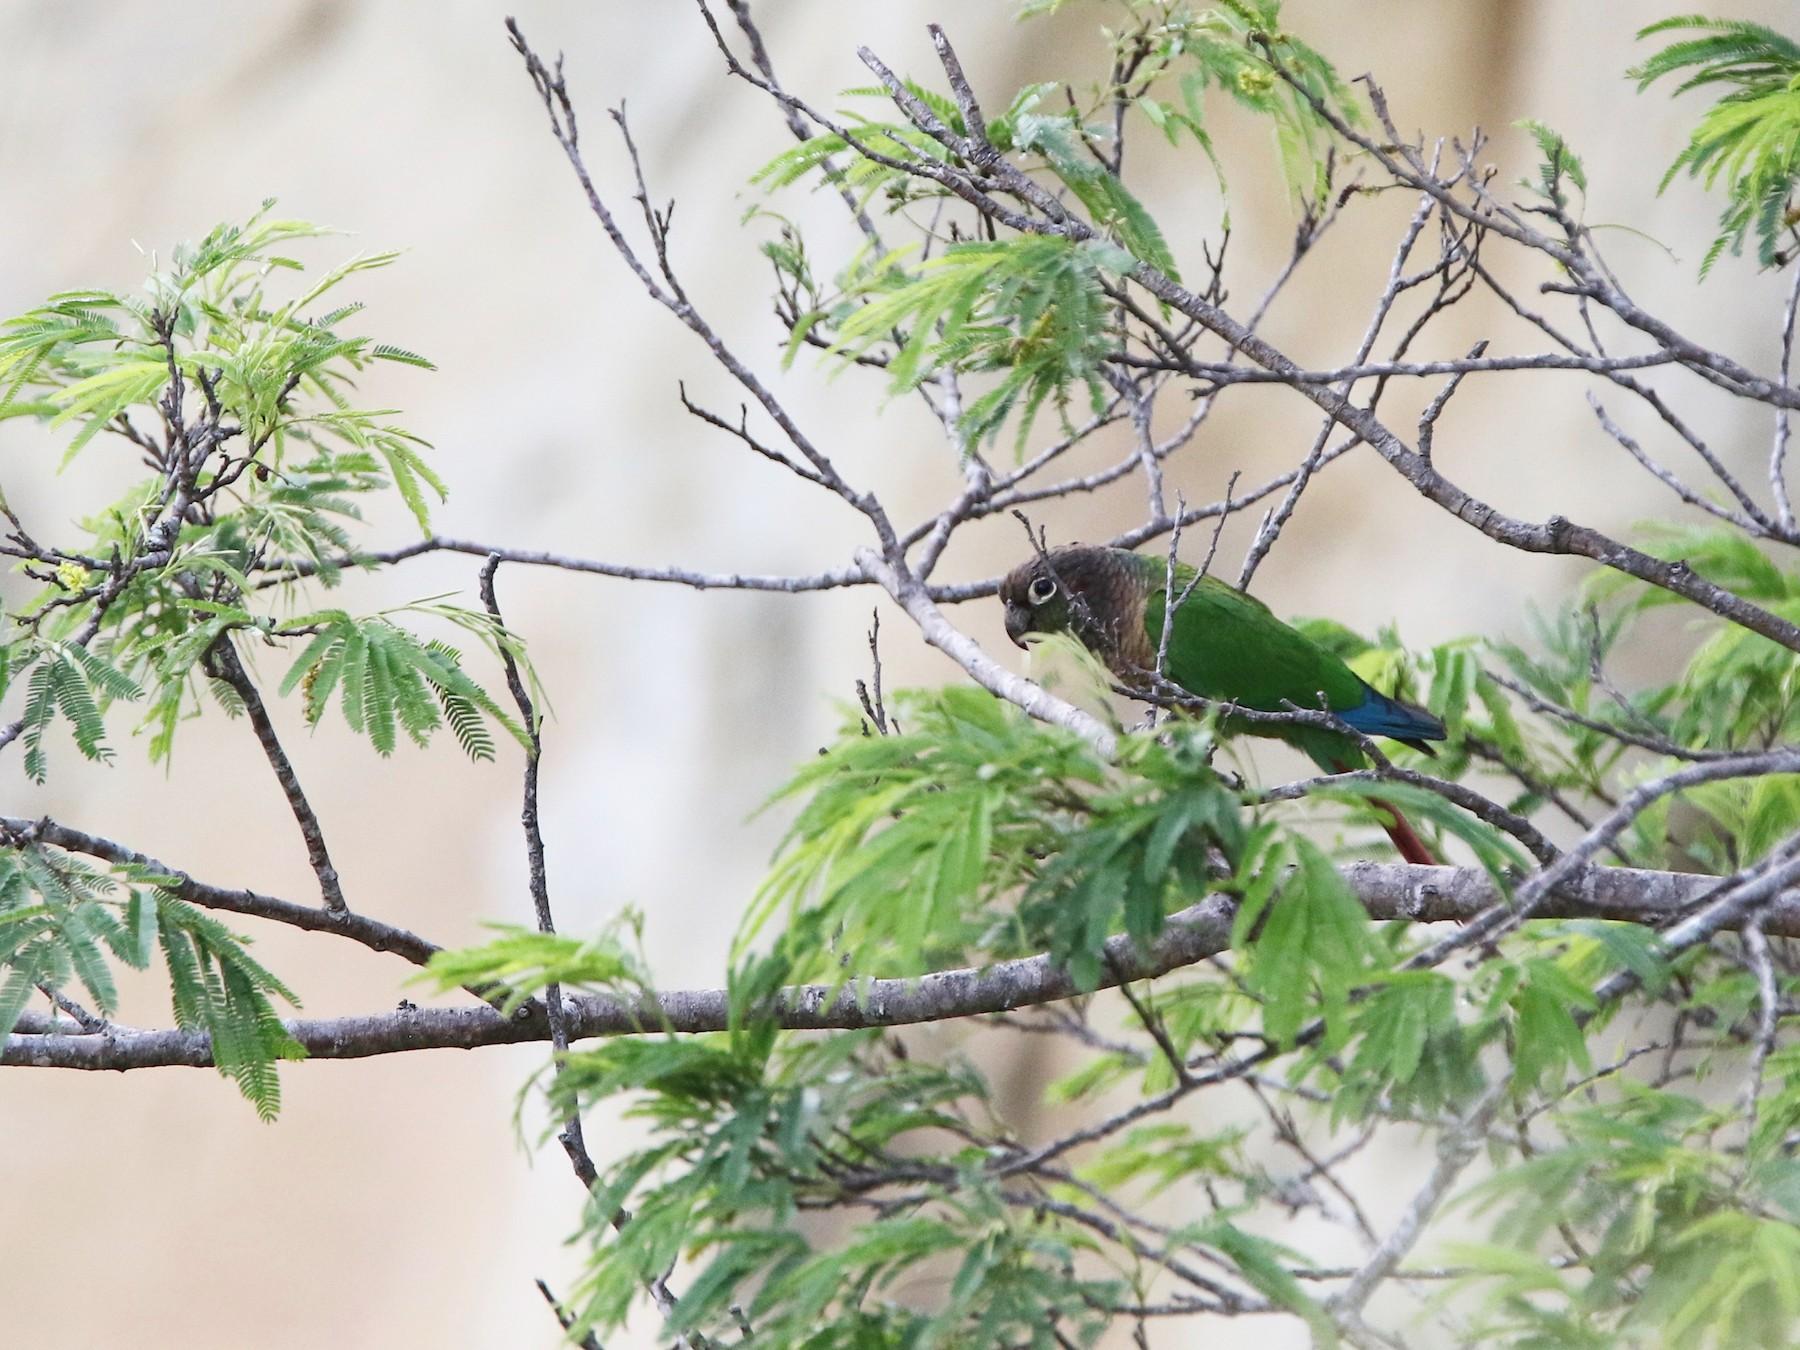 Green-cheeked Parakeet - Olivier Langrand